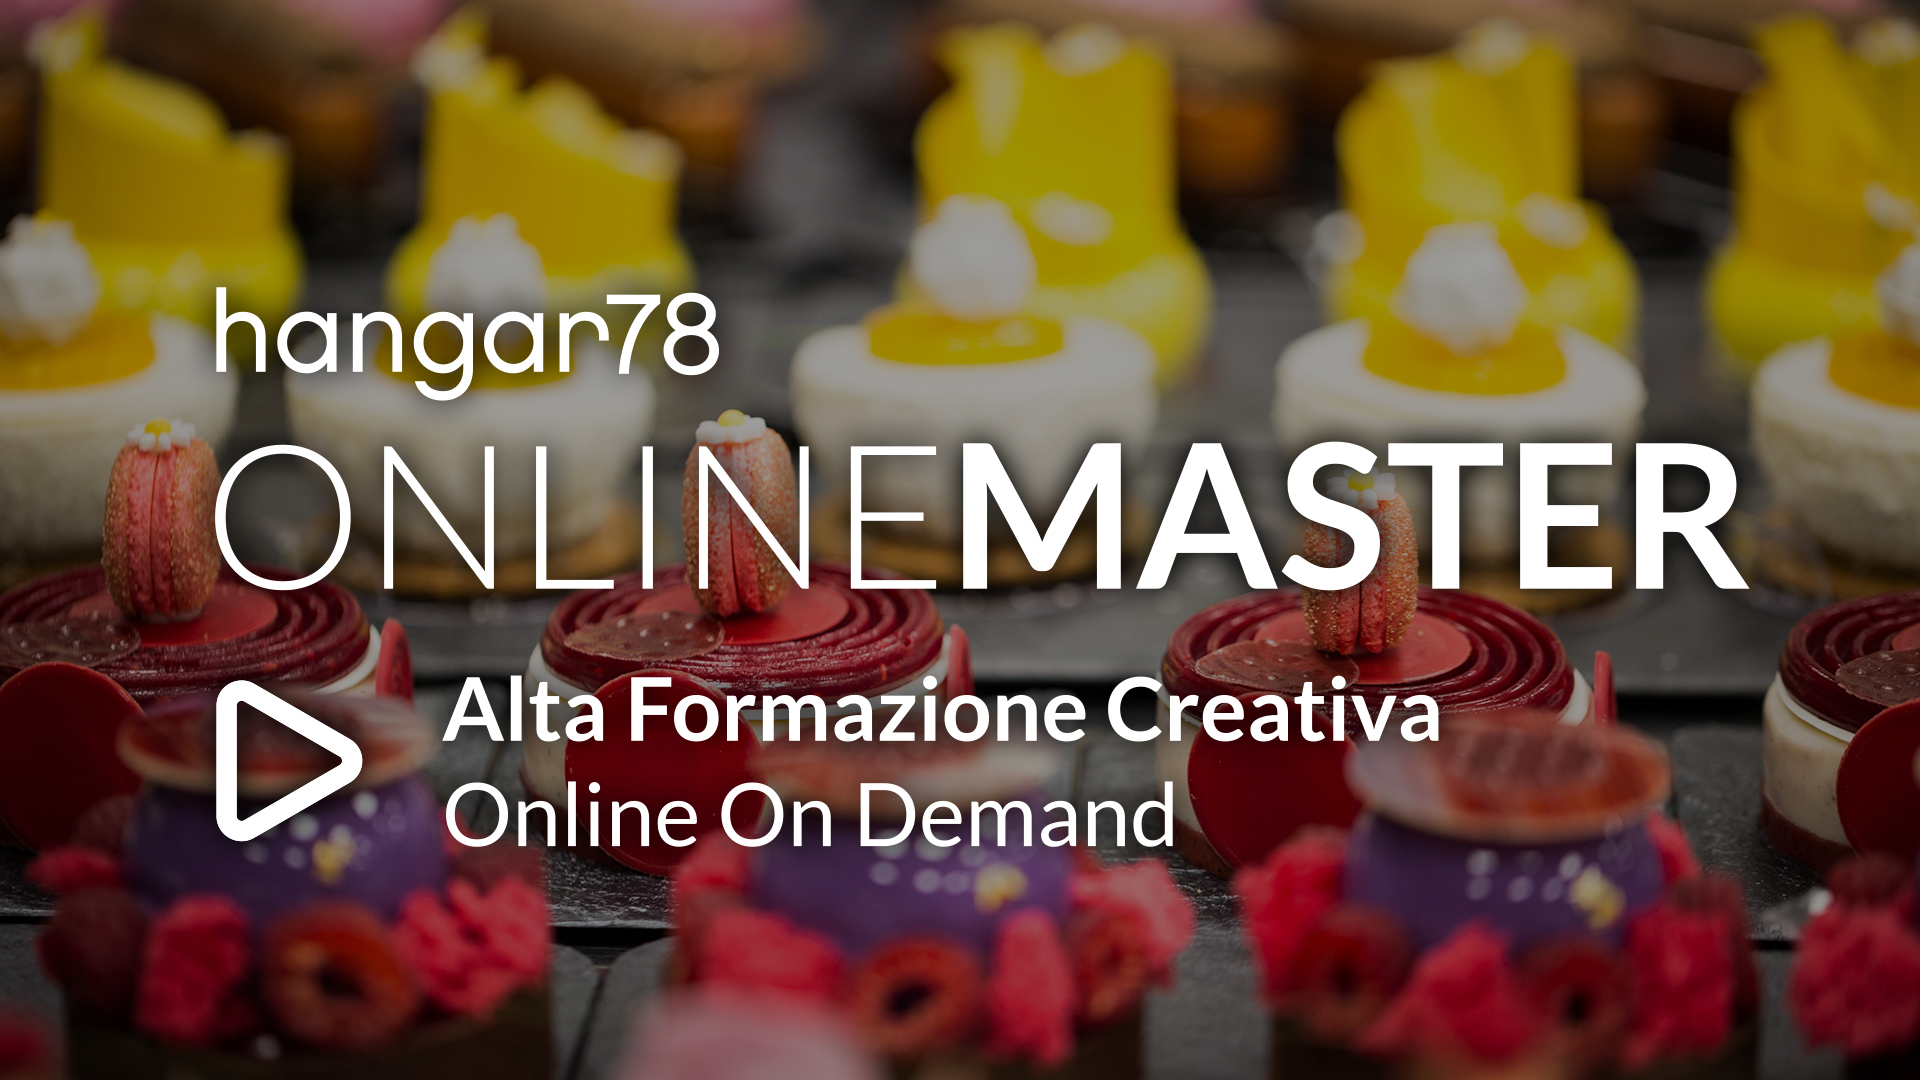 hangar78-online master